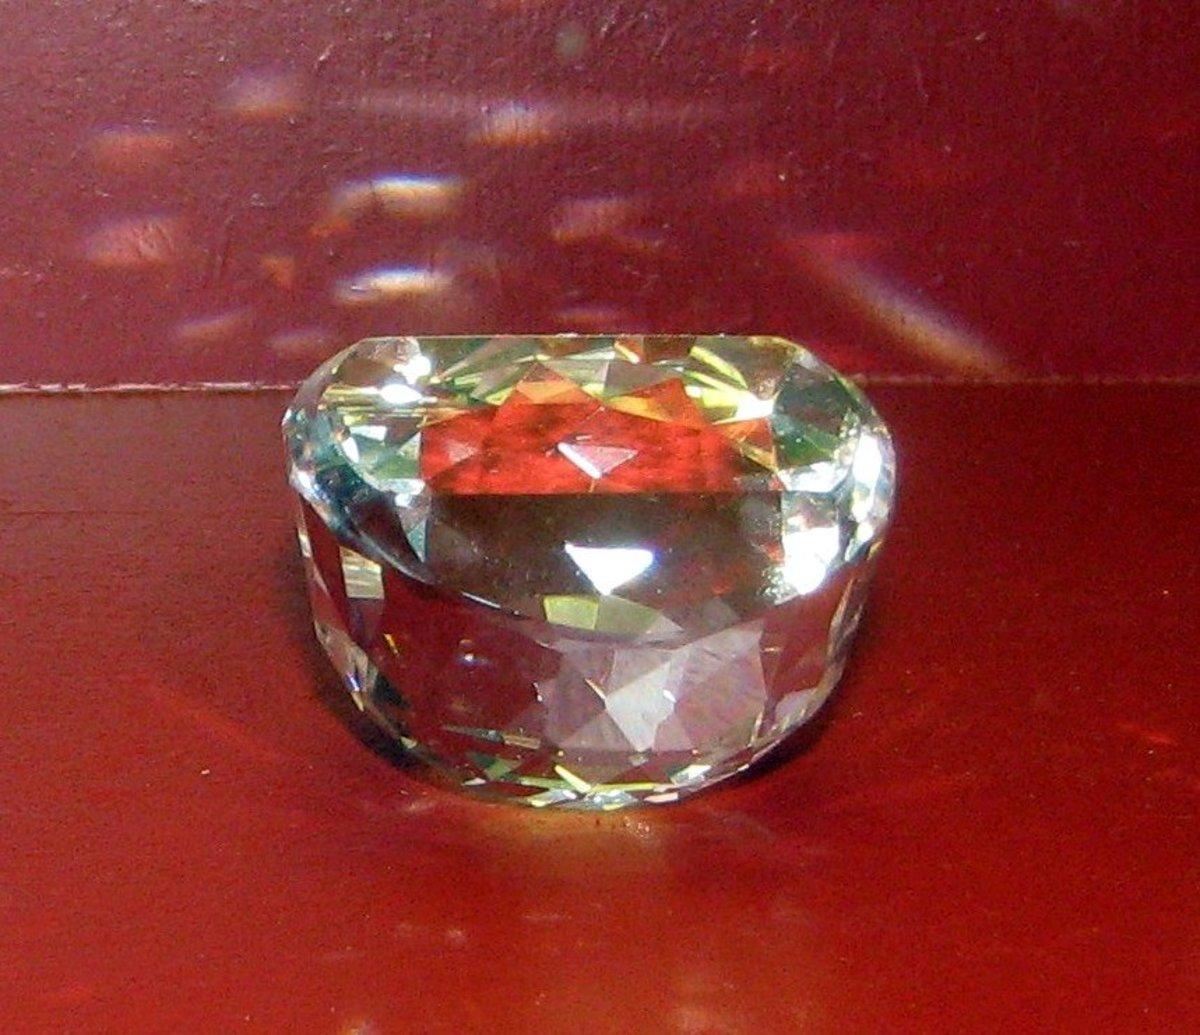 Orlov diamond Shown Upside-Down